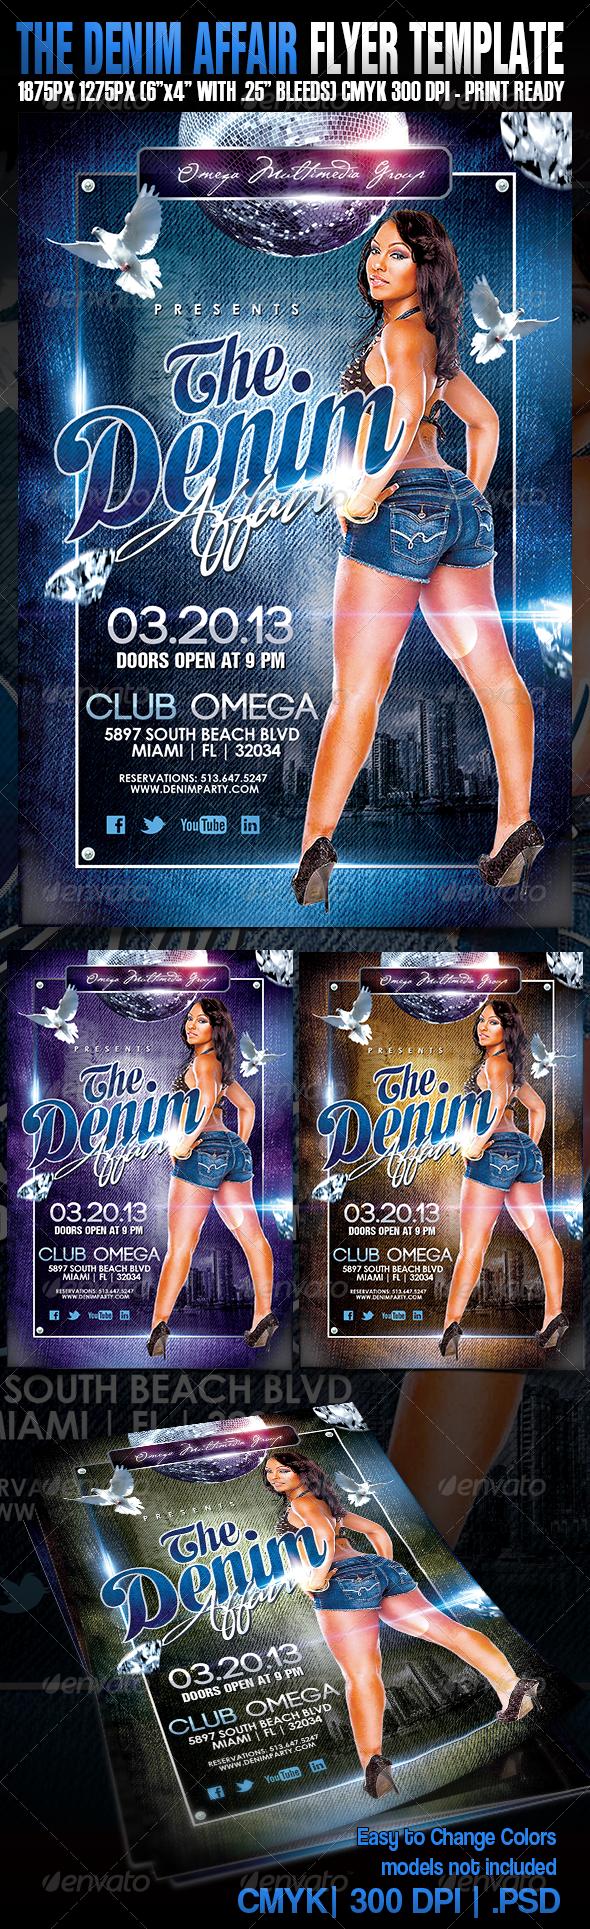 The Denim Affair - Events Flyers